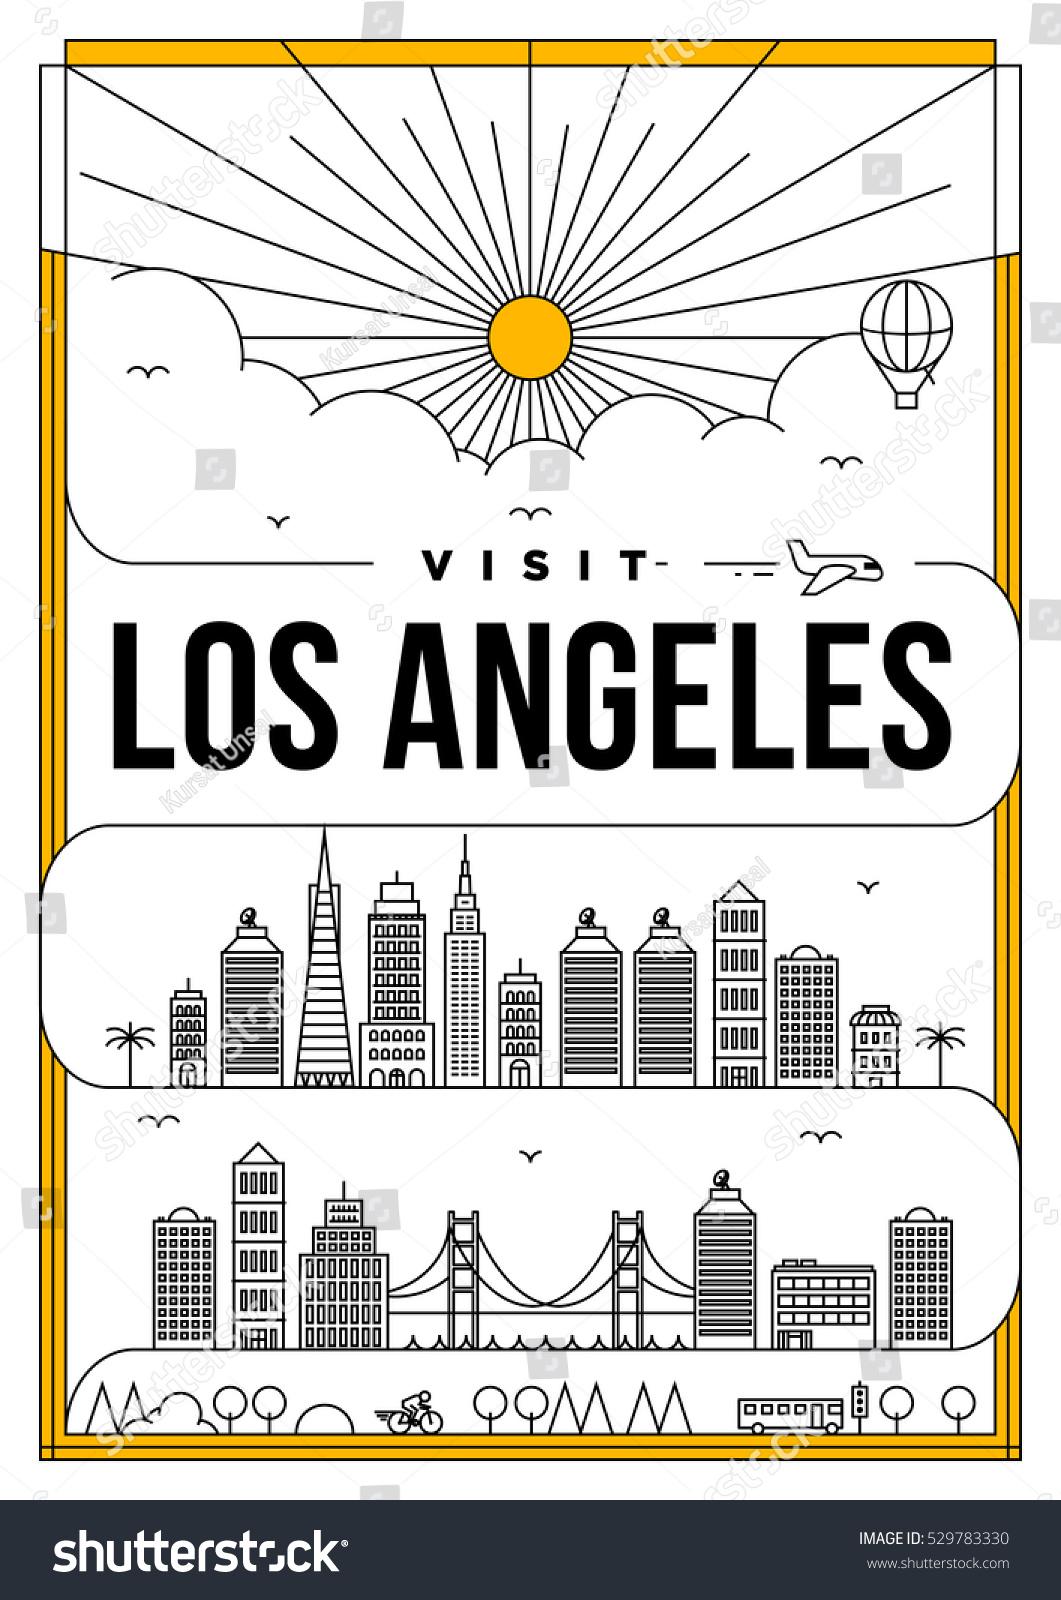 D d poster design - Linear Travel Los Angeles Poster Design